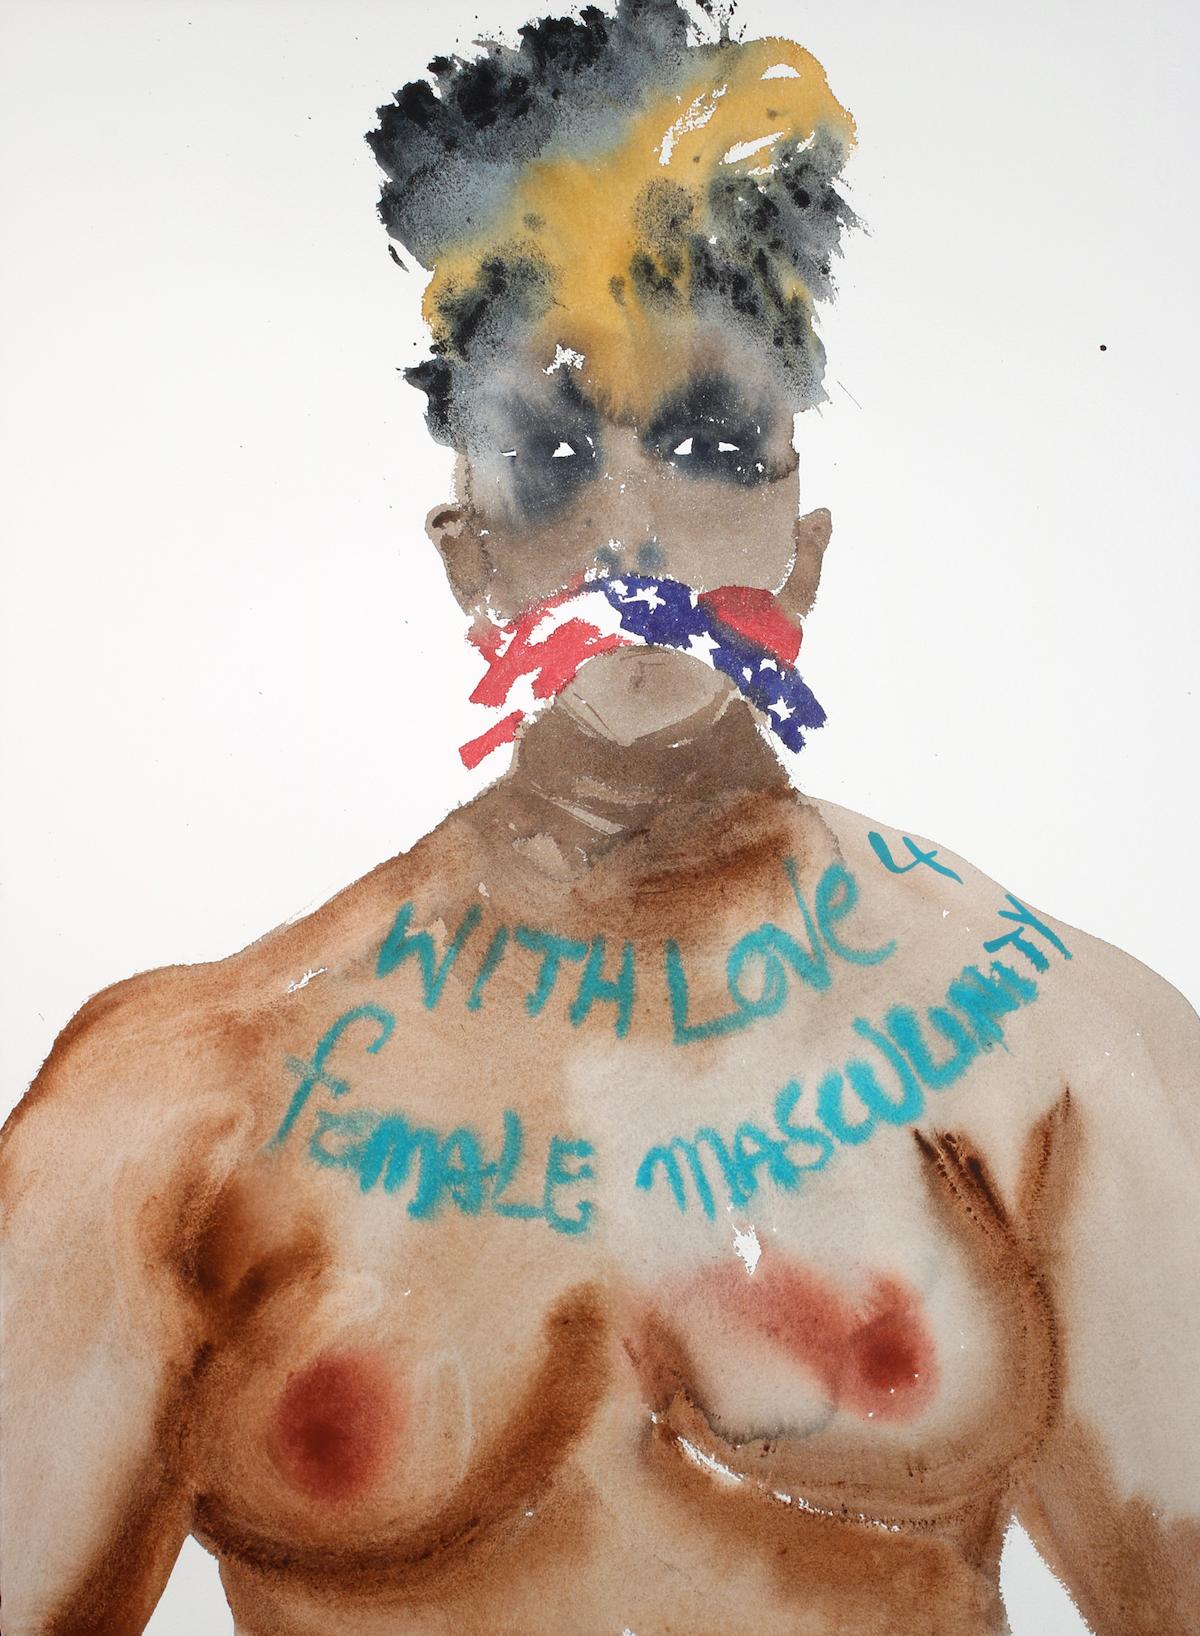 With Love For Female Masculinity Nadine Faraj (2016) Courtesy of Anna Zorina Gallery, New York City